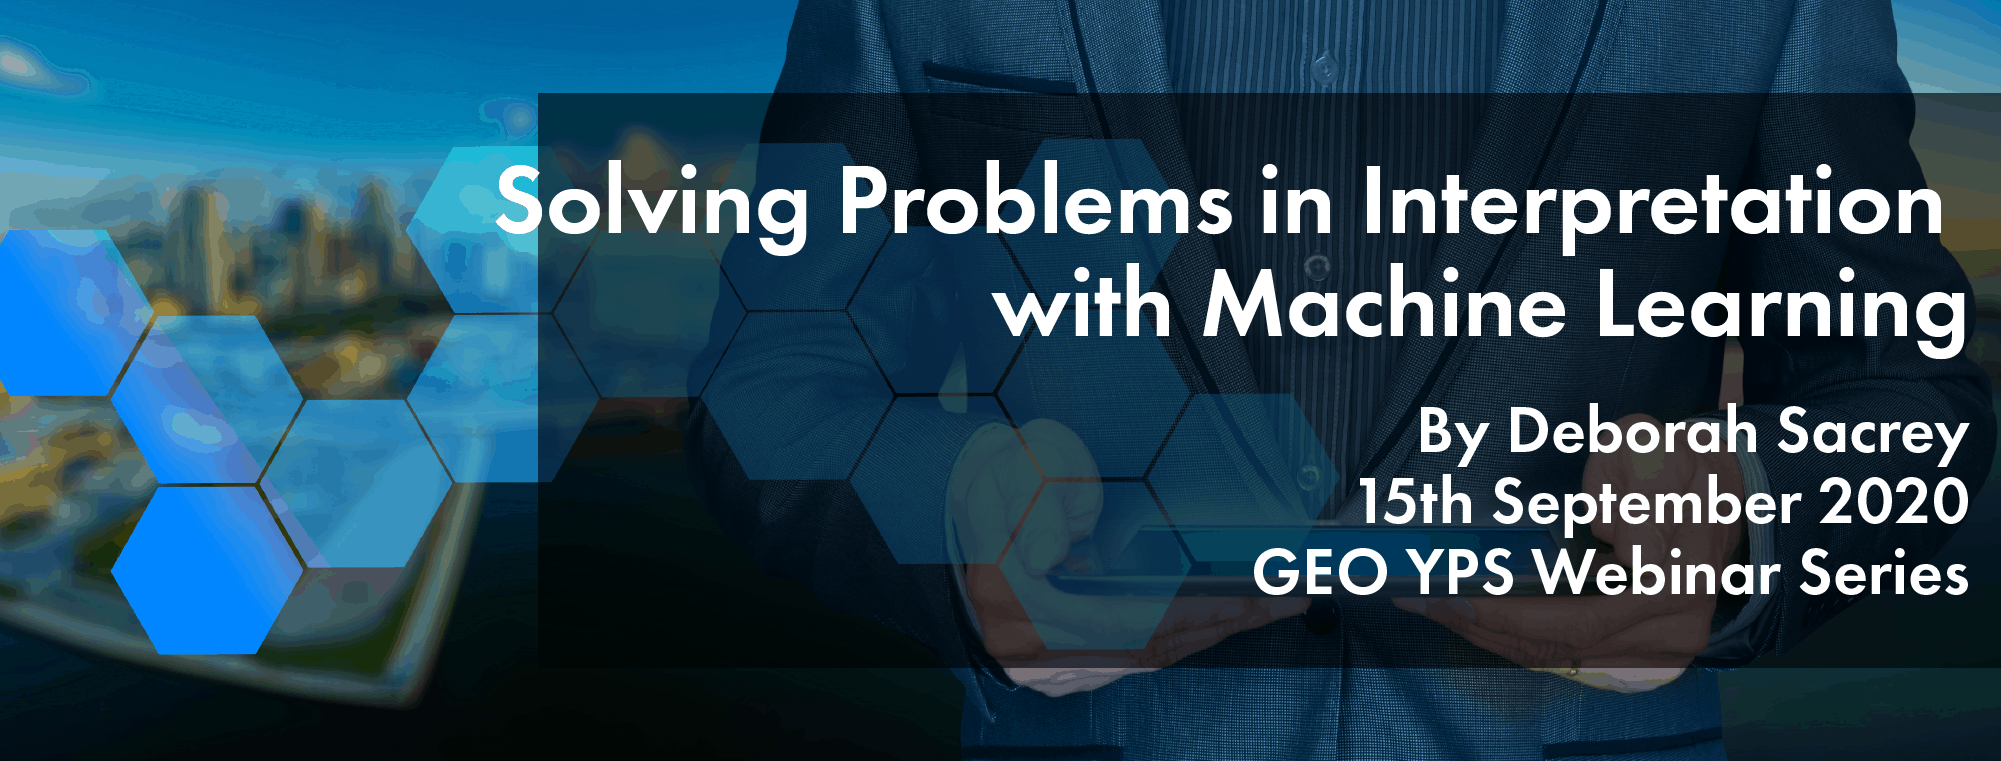 Solving Problems in Interpretation with Machine Learning by Deborah Sacrey